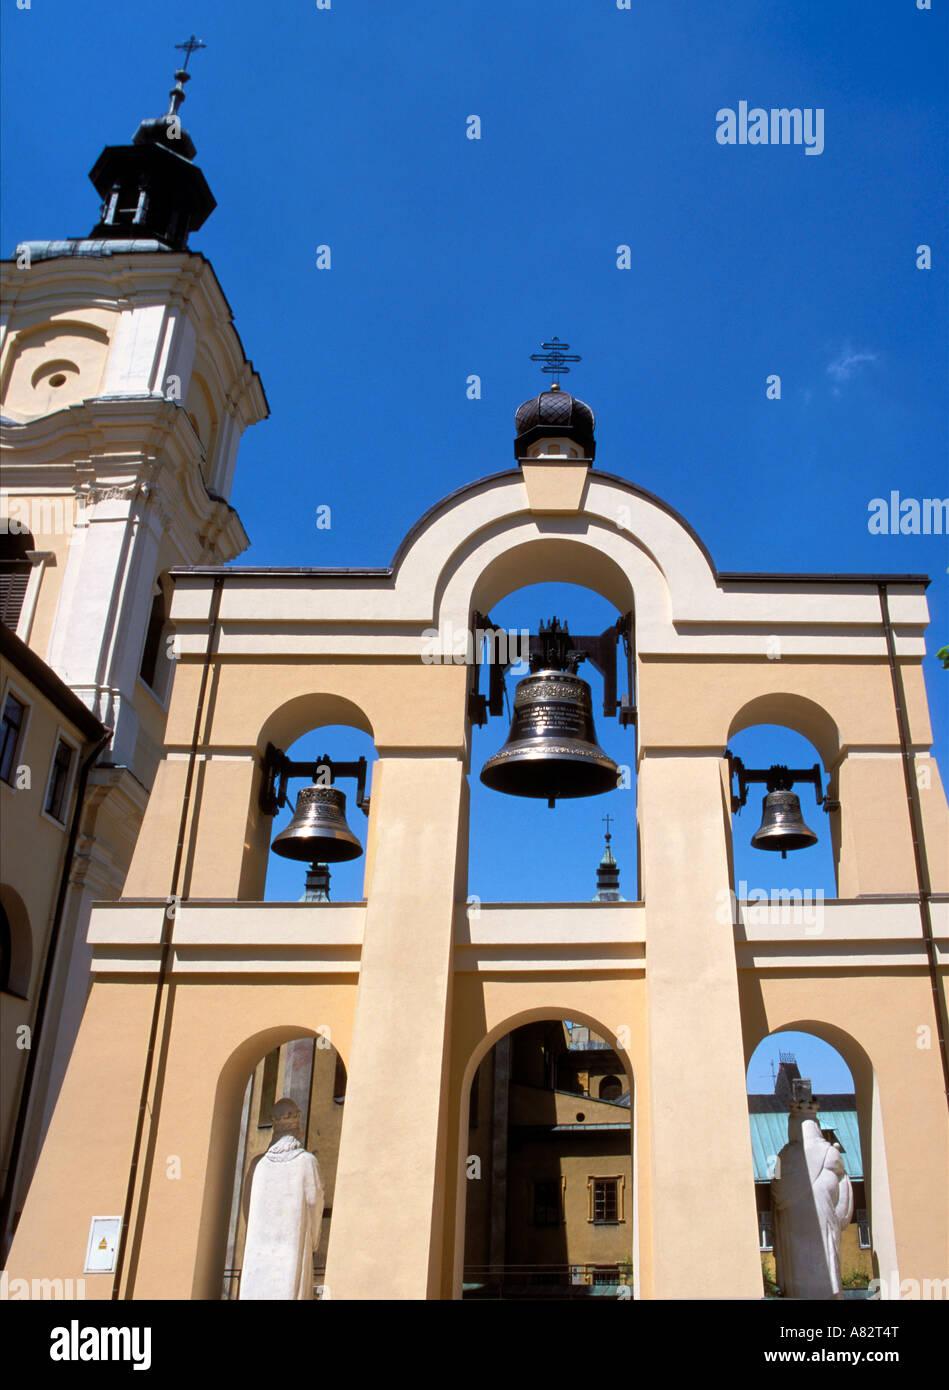 Bells of Orthodox Church in Przemysl of Poland - Stock Image